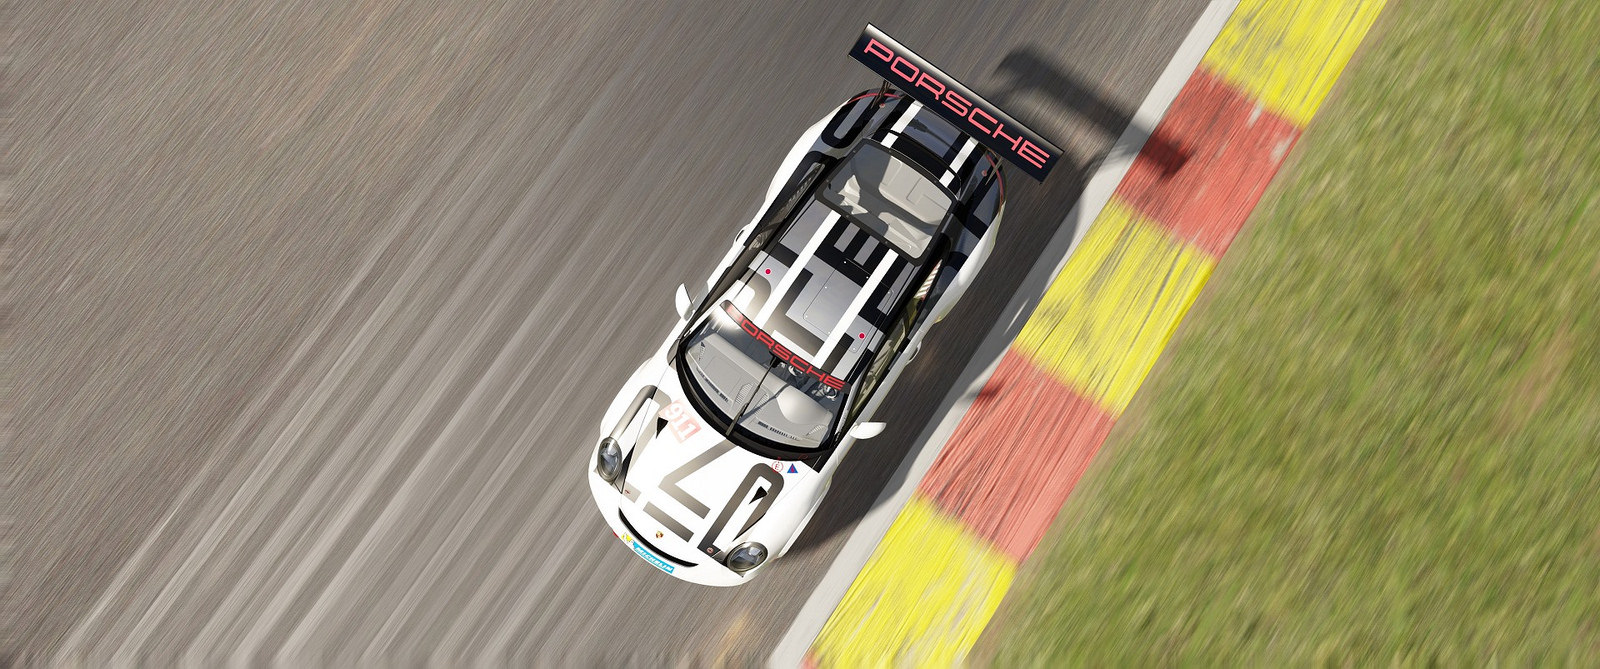 Assetto Corsa Porsche Vol. 3 DLC .jpg